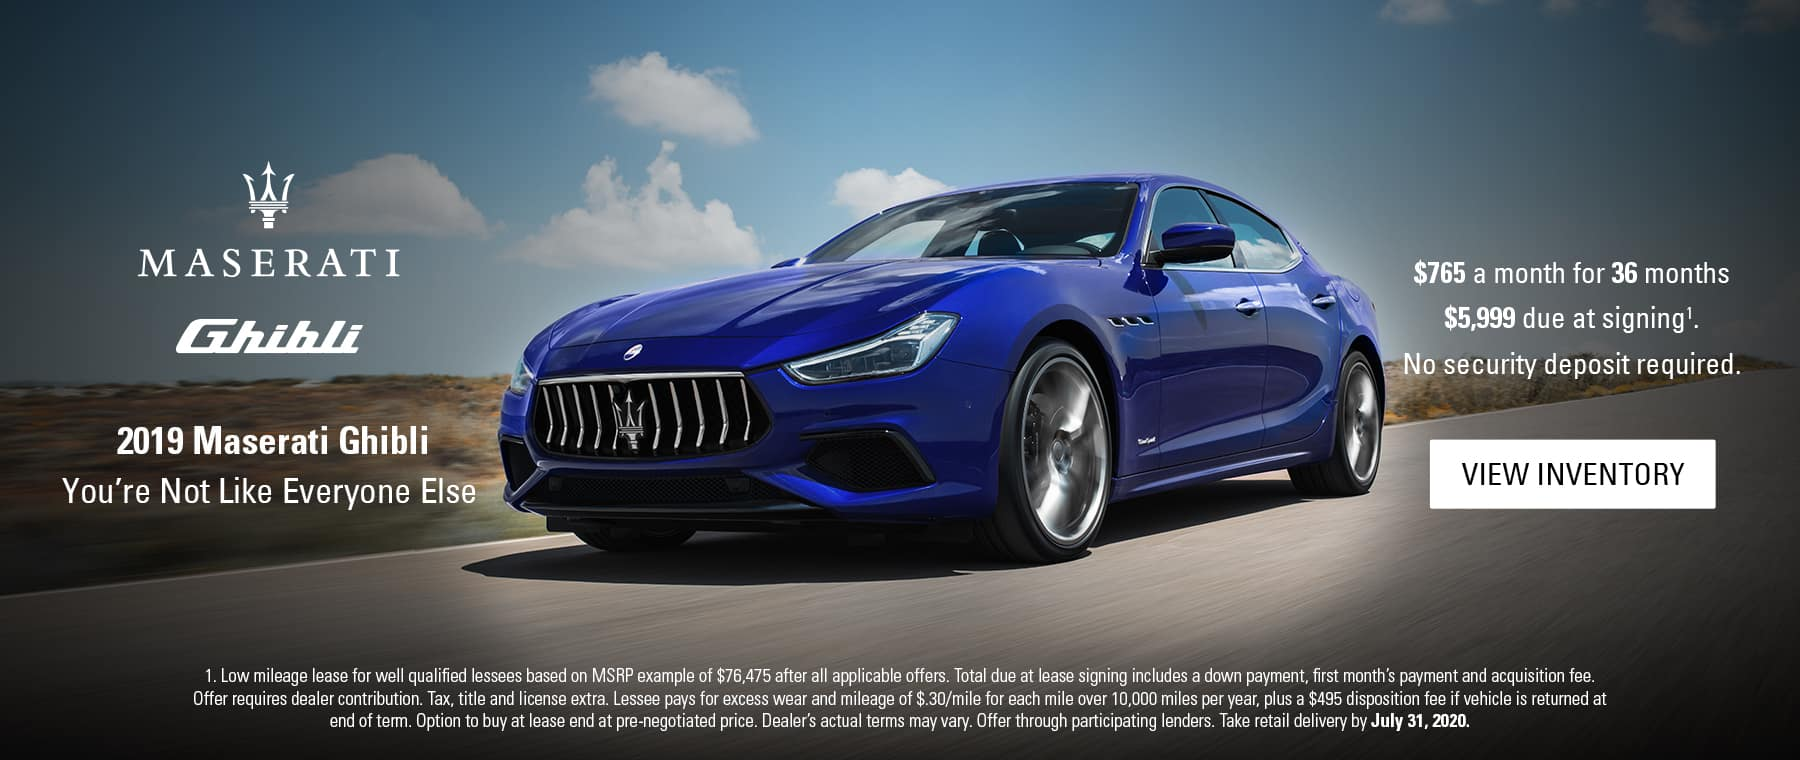 2019 Maserati Ghibli $765